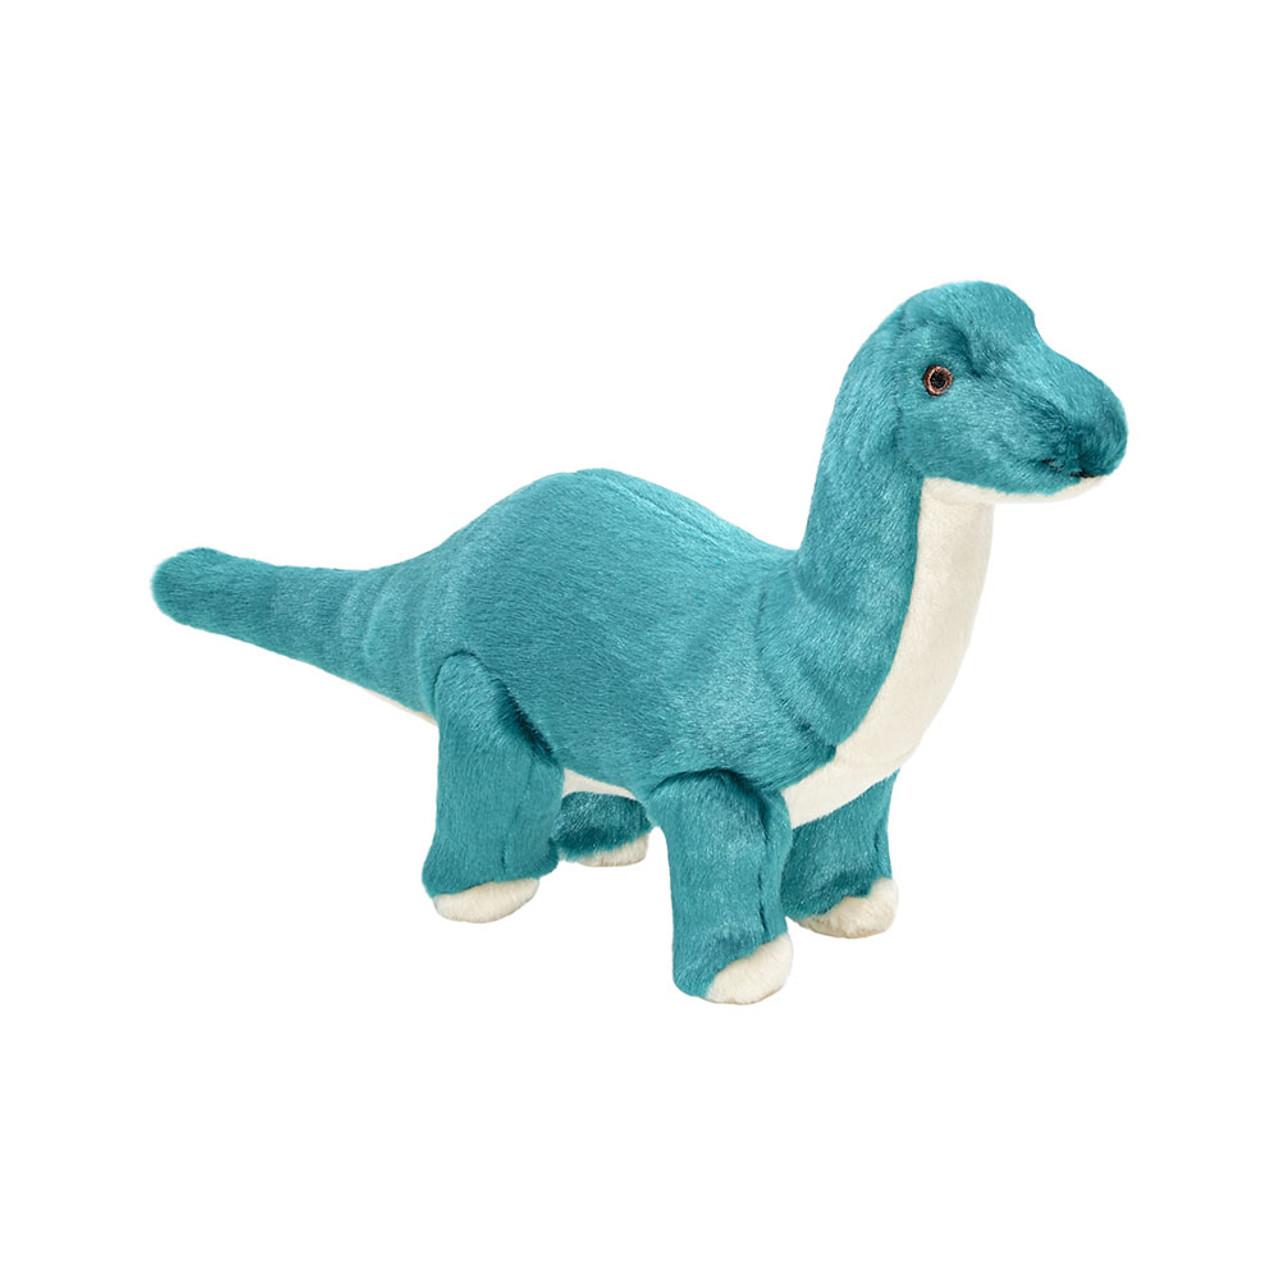 Fluff & Tuff Ross Brachiosaurus Plush Dog Toy